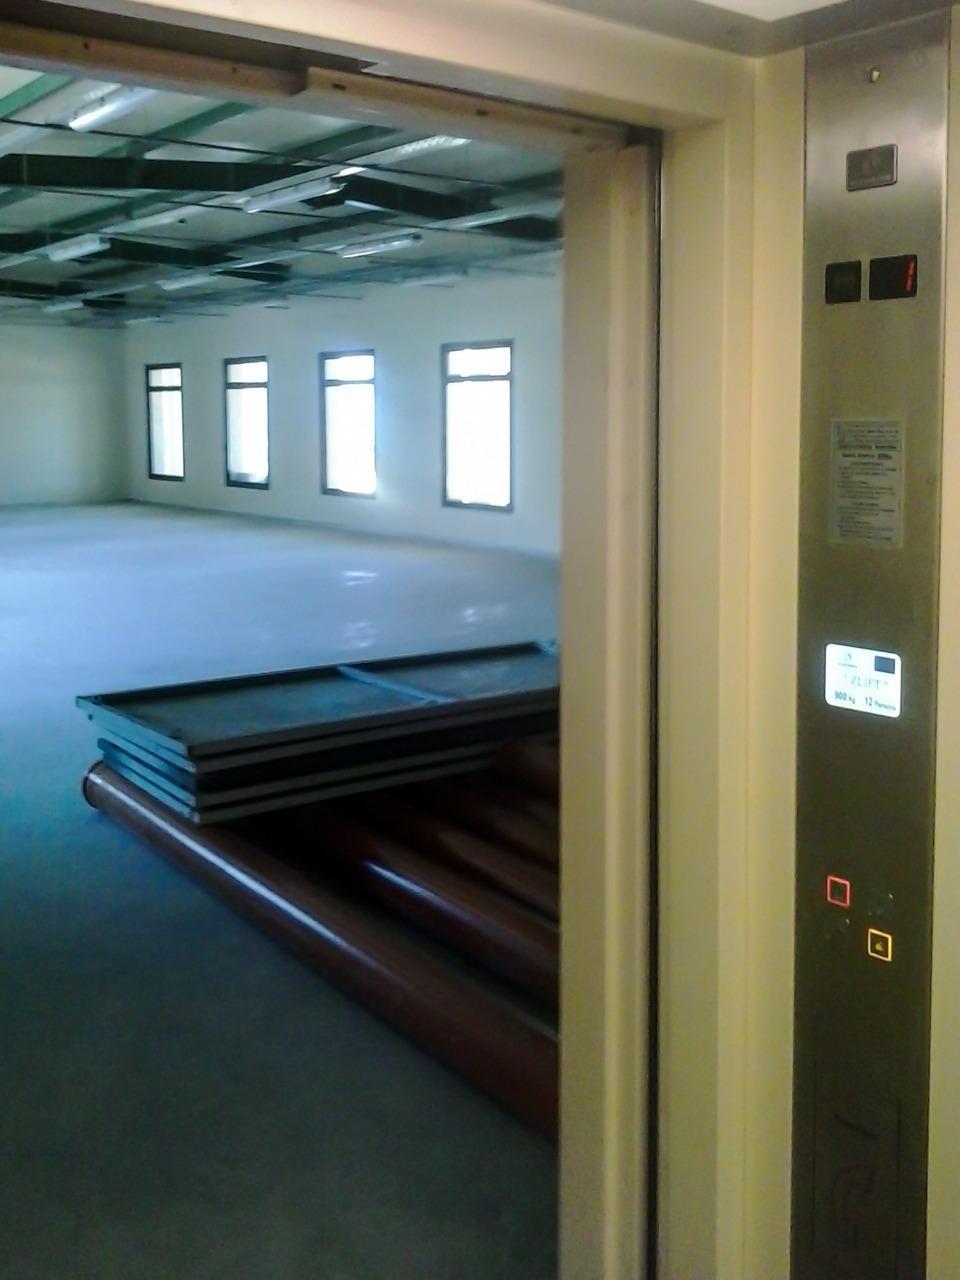 zlift-erga-lifts-19 Εγκατάσταση Ανελκυστήρα - Ρόδος